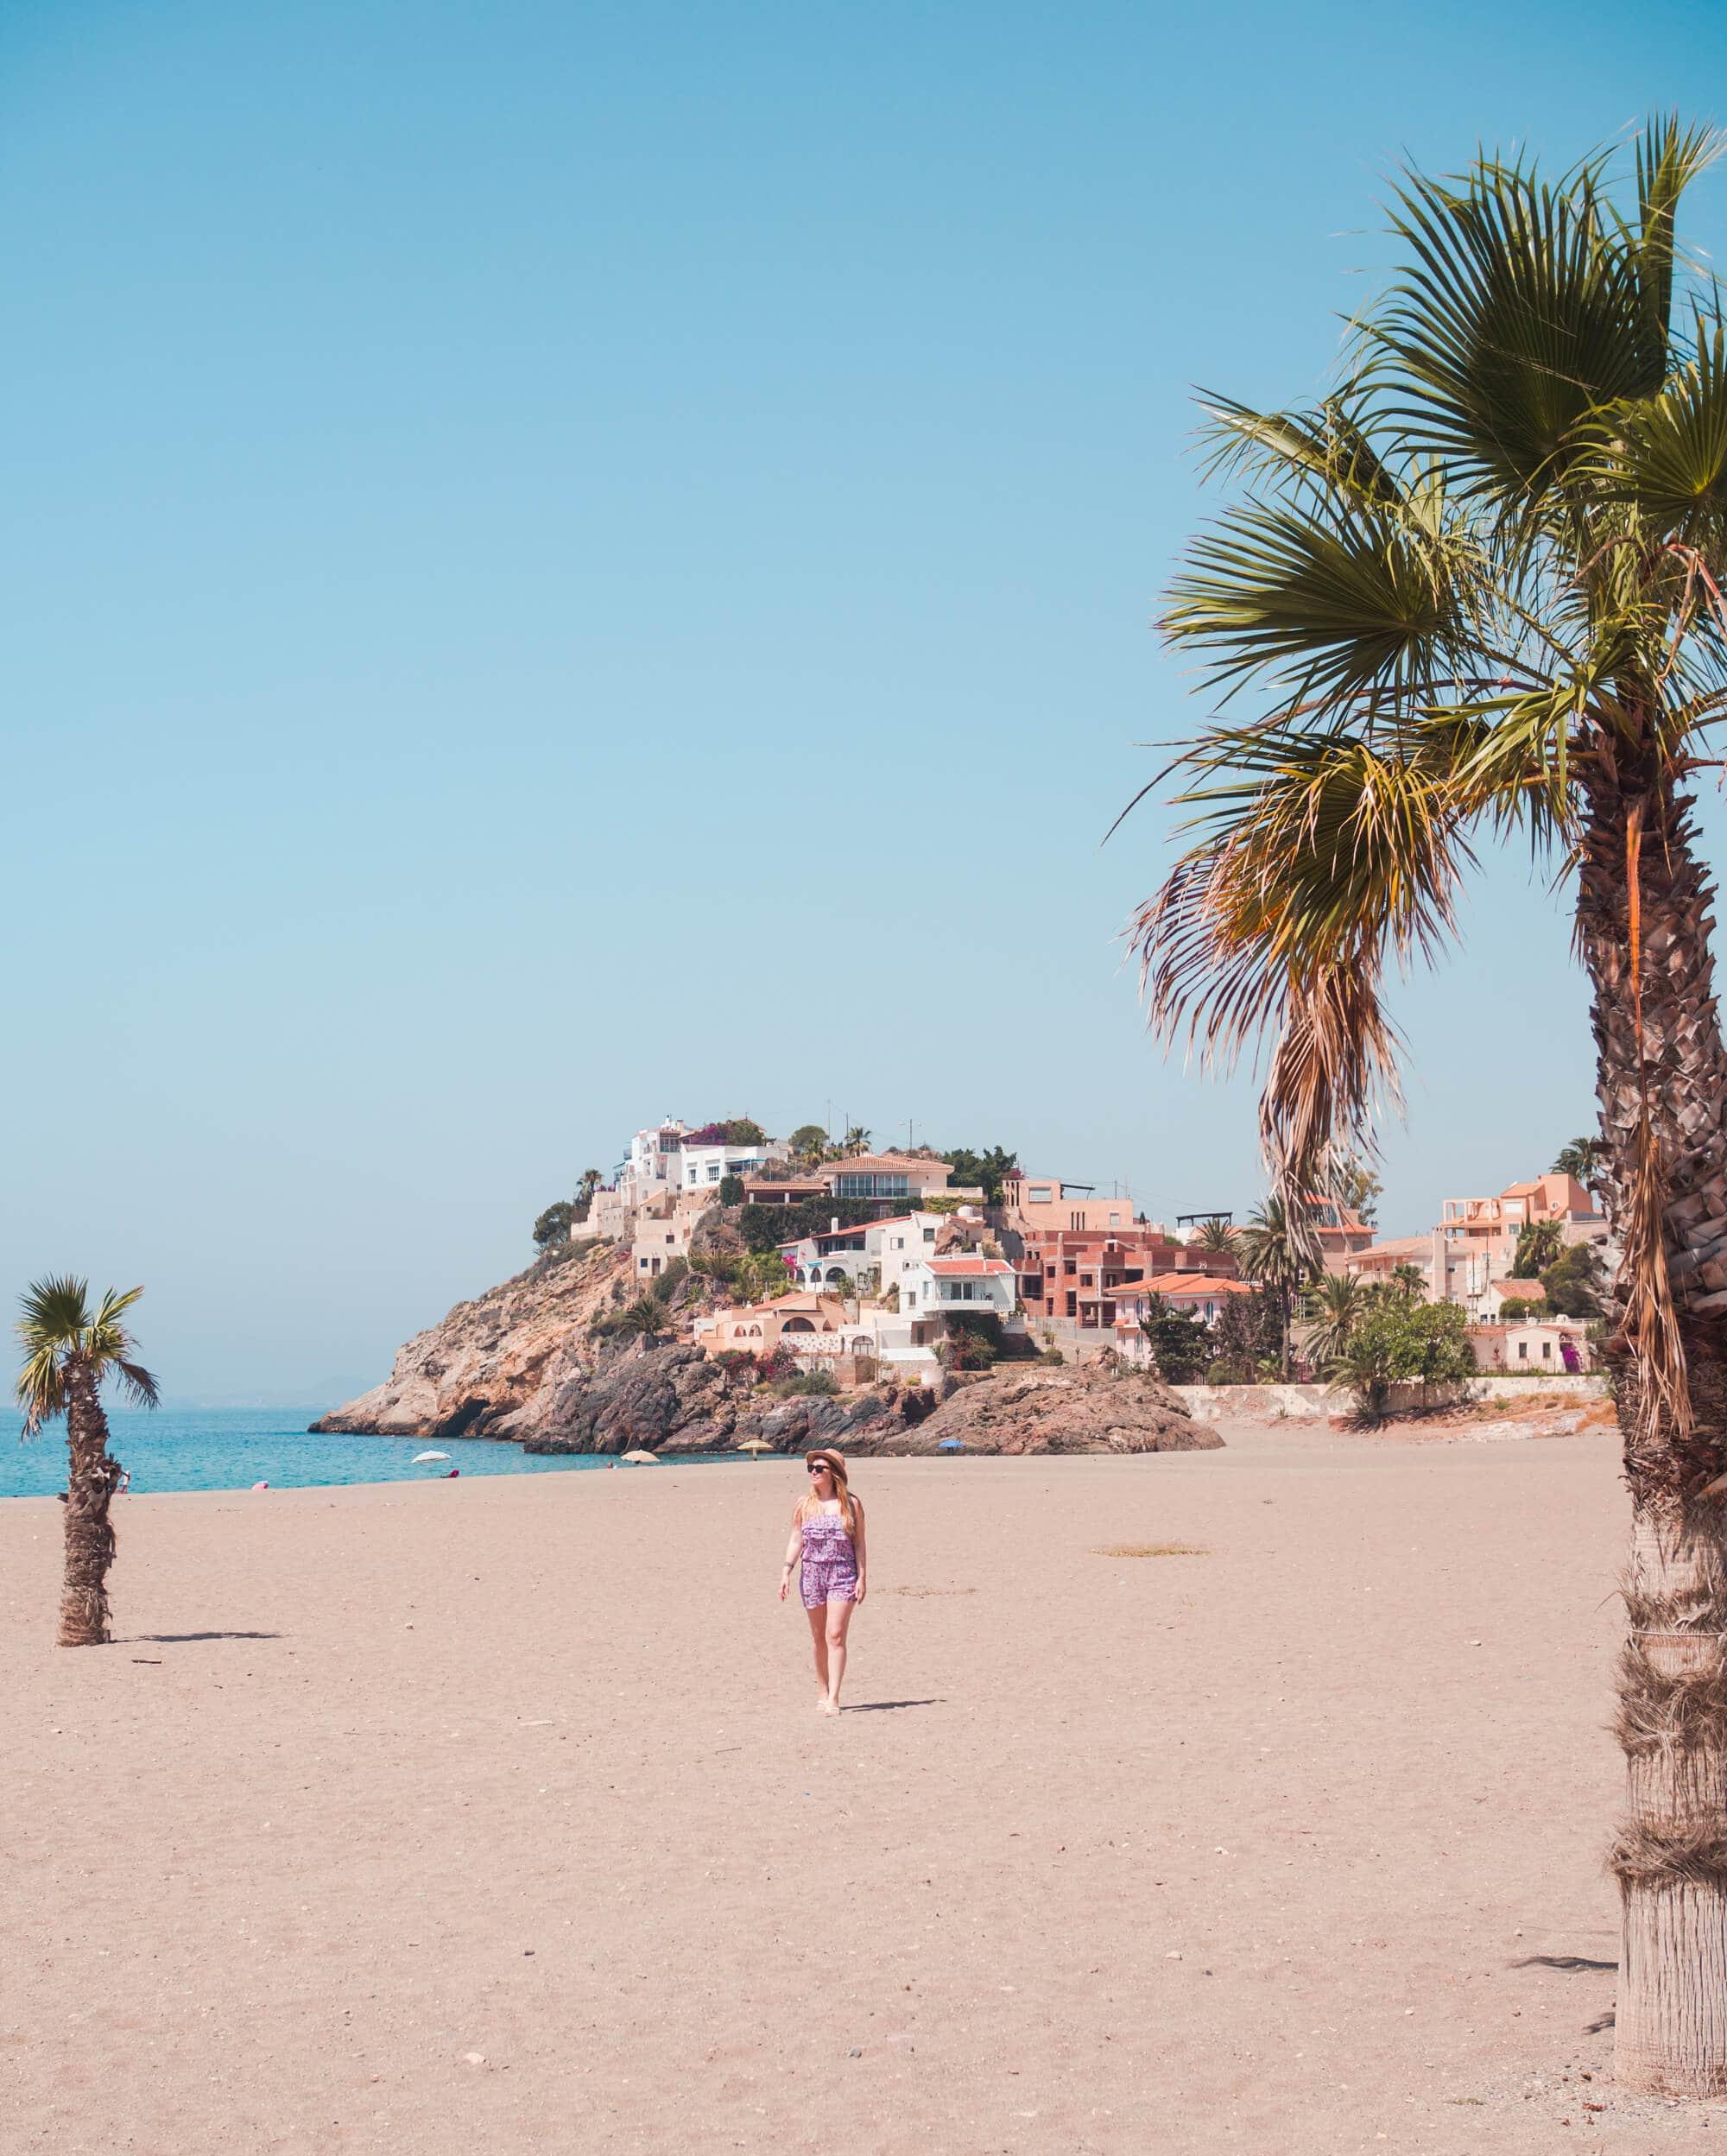 Playa Bolnuevo Beach in Mazarrón, Spain